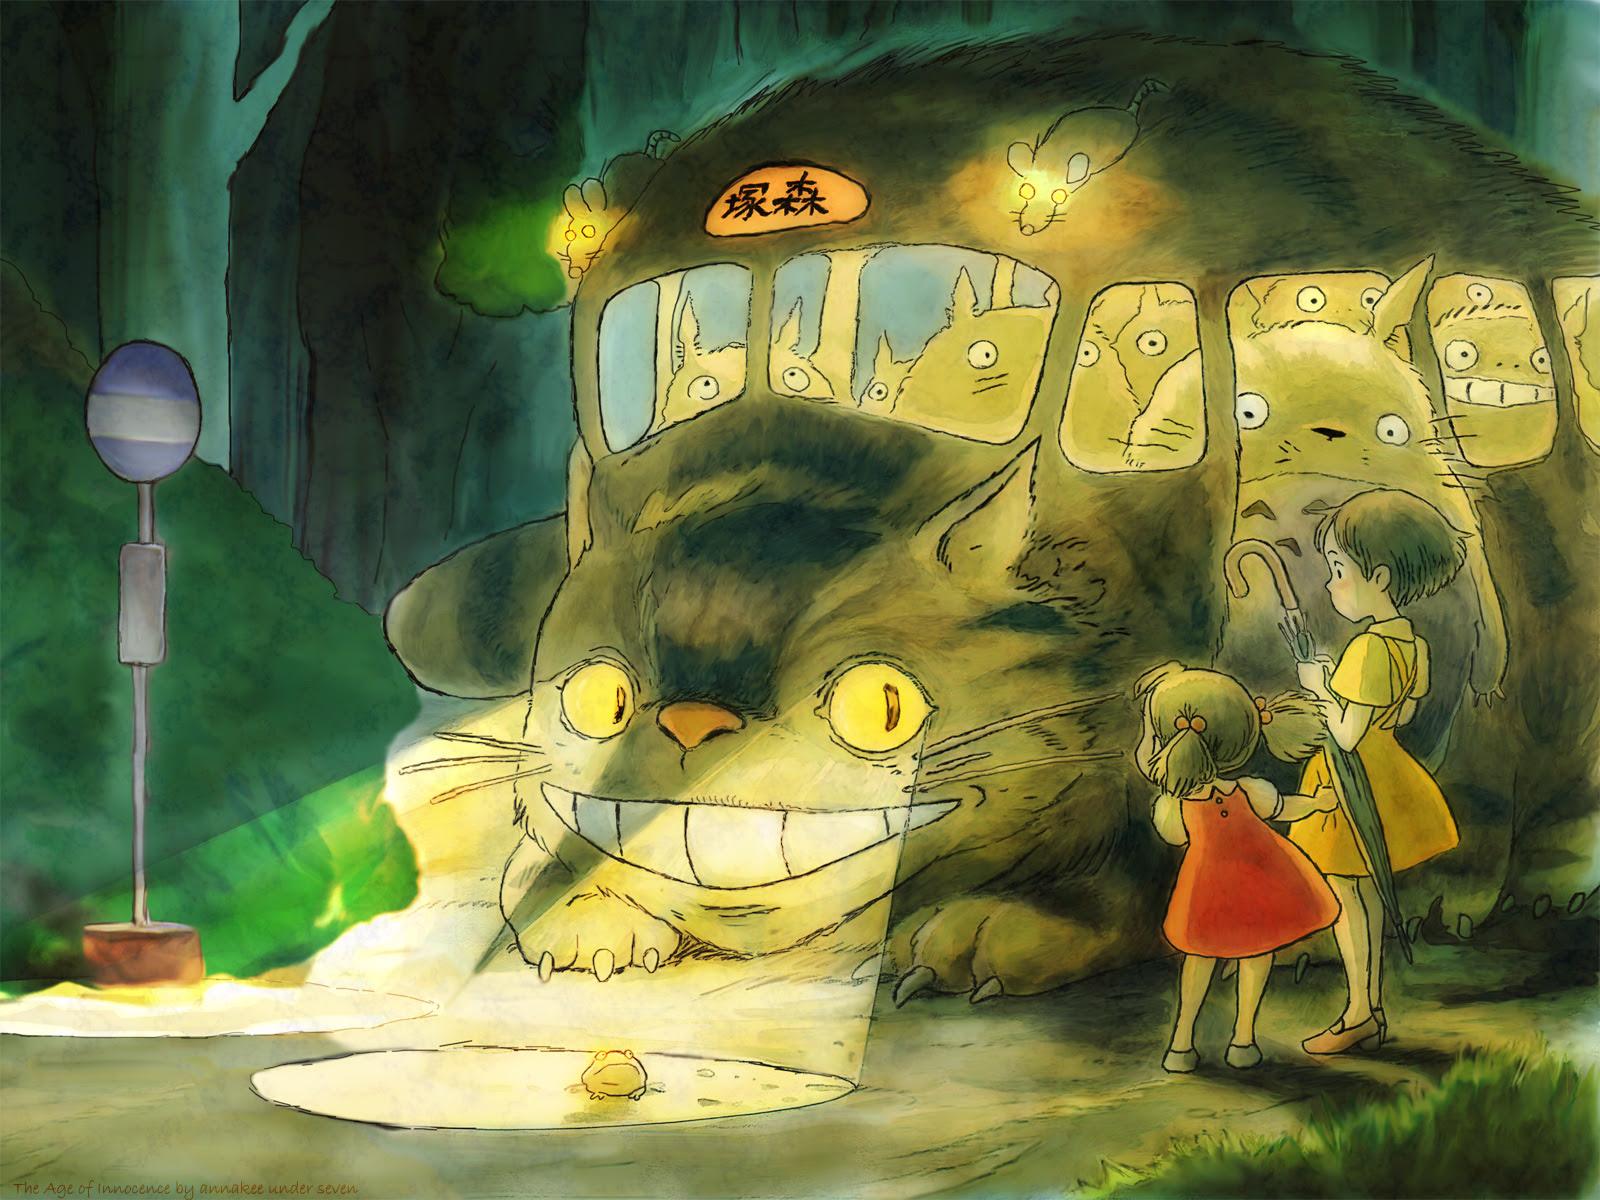 My Neighbor Totoro Wallpaper The Age Of Innocence Minitokyo